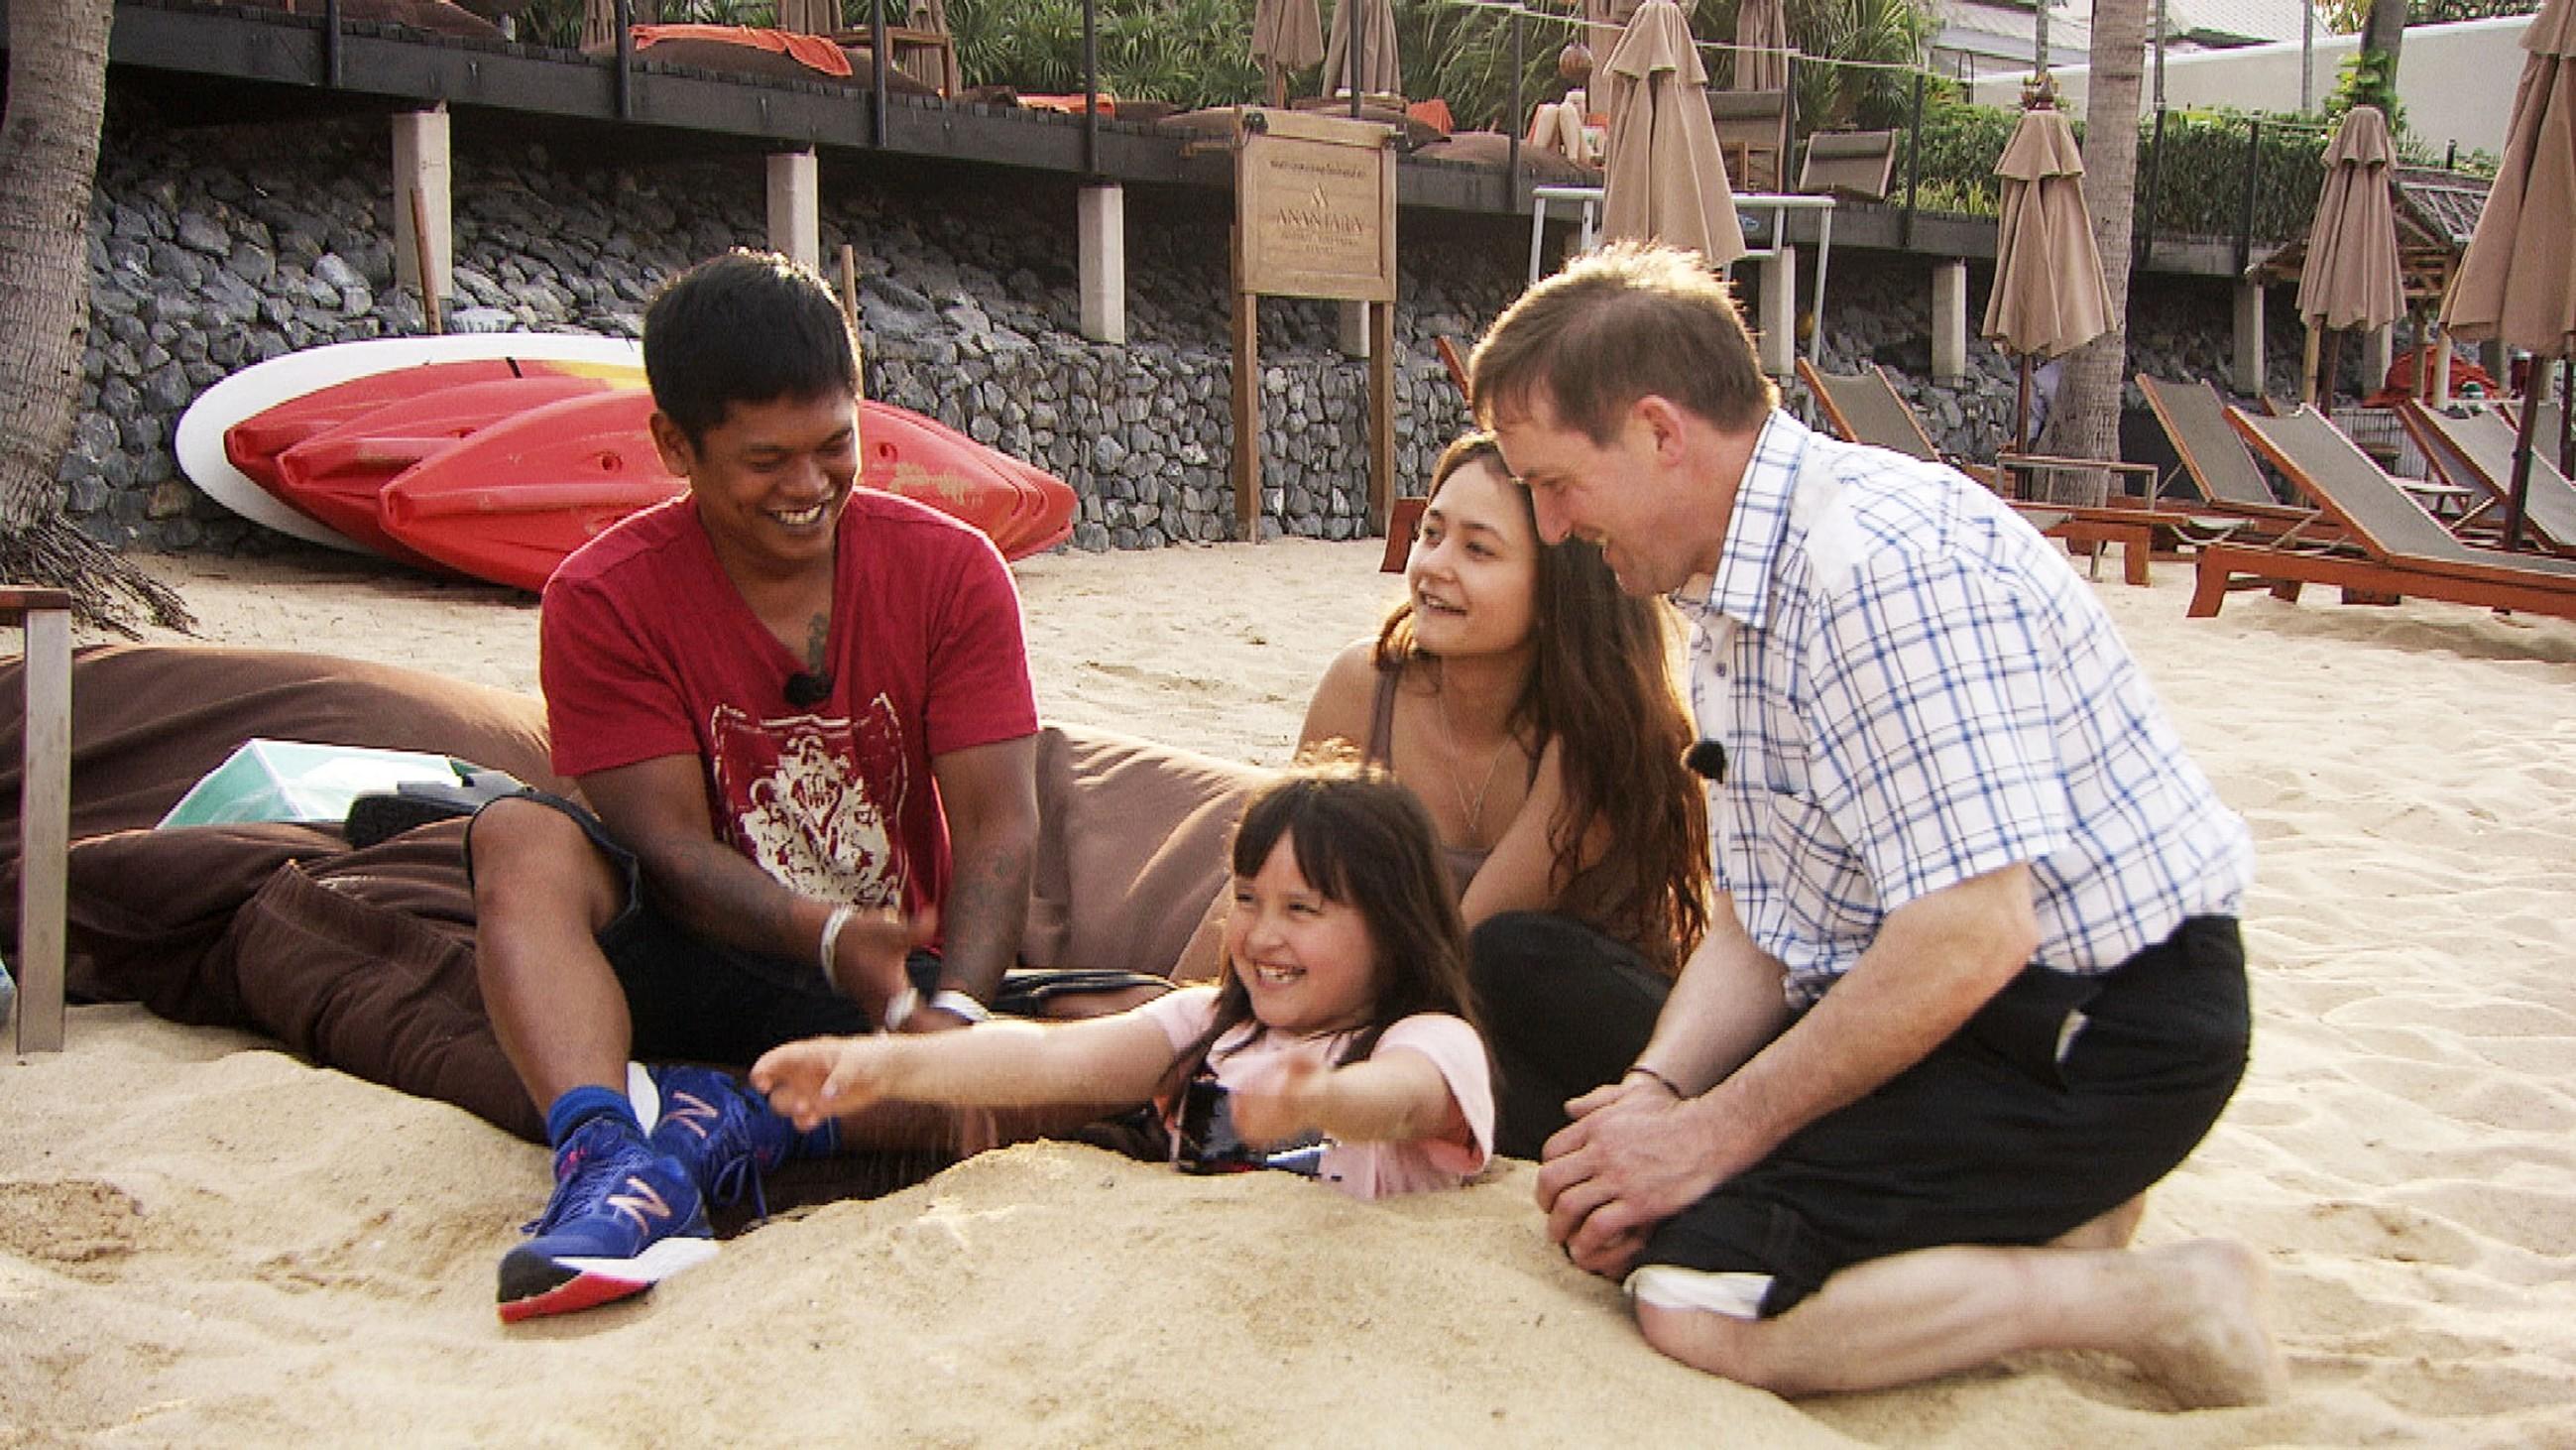 Josef & Narumol Spezial - Narumols Sohn Jack feiert seinen Geburtstag am Strand